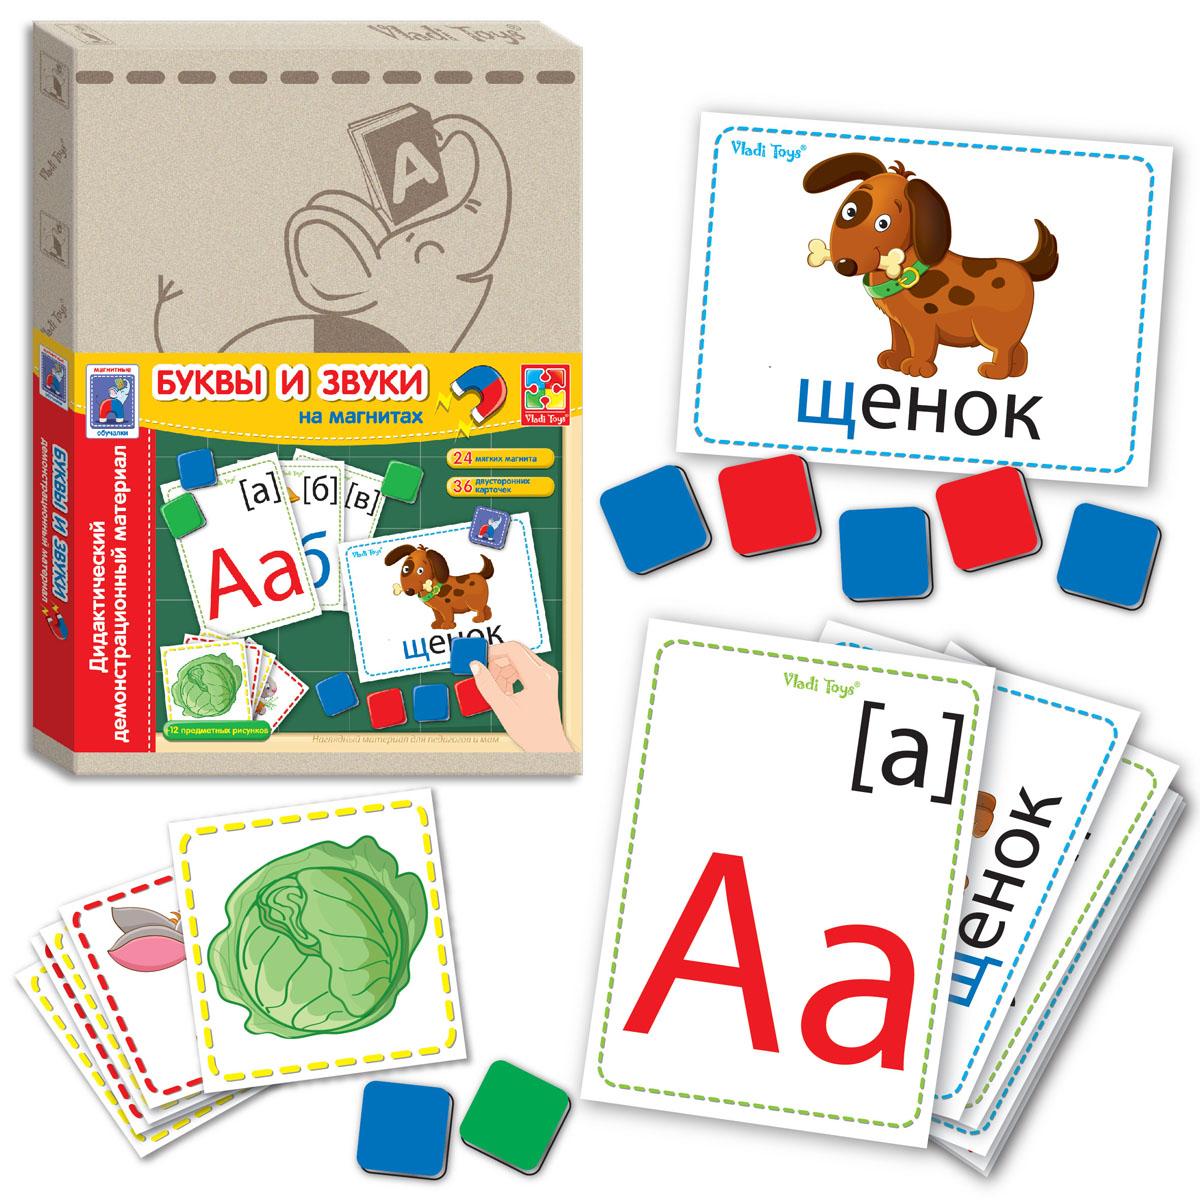 Игра АКЦИЯ19 Игр Набор с магнитами Буквы и звуки